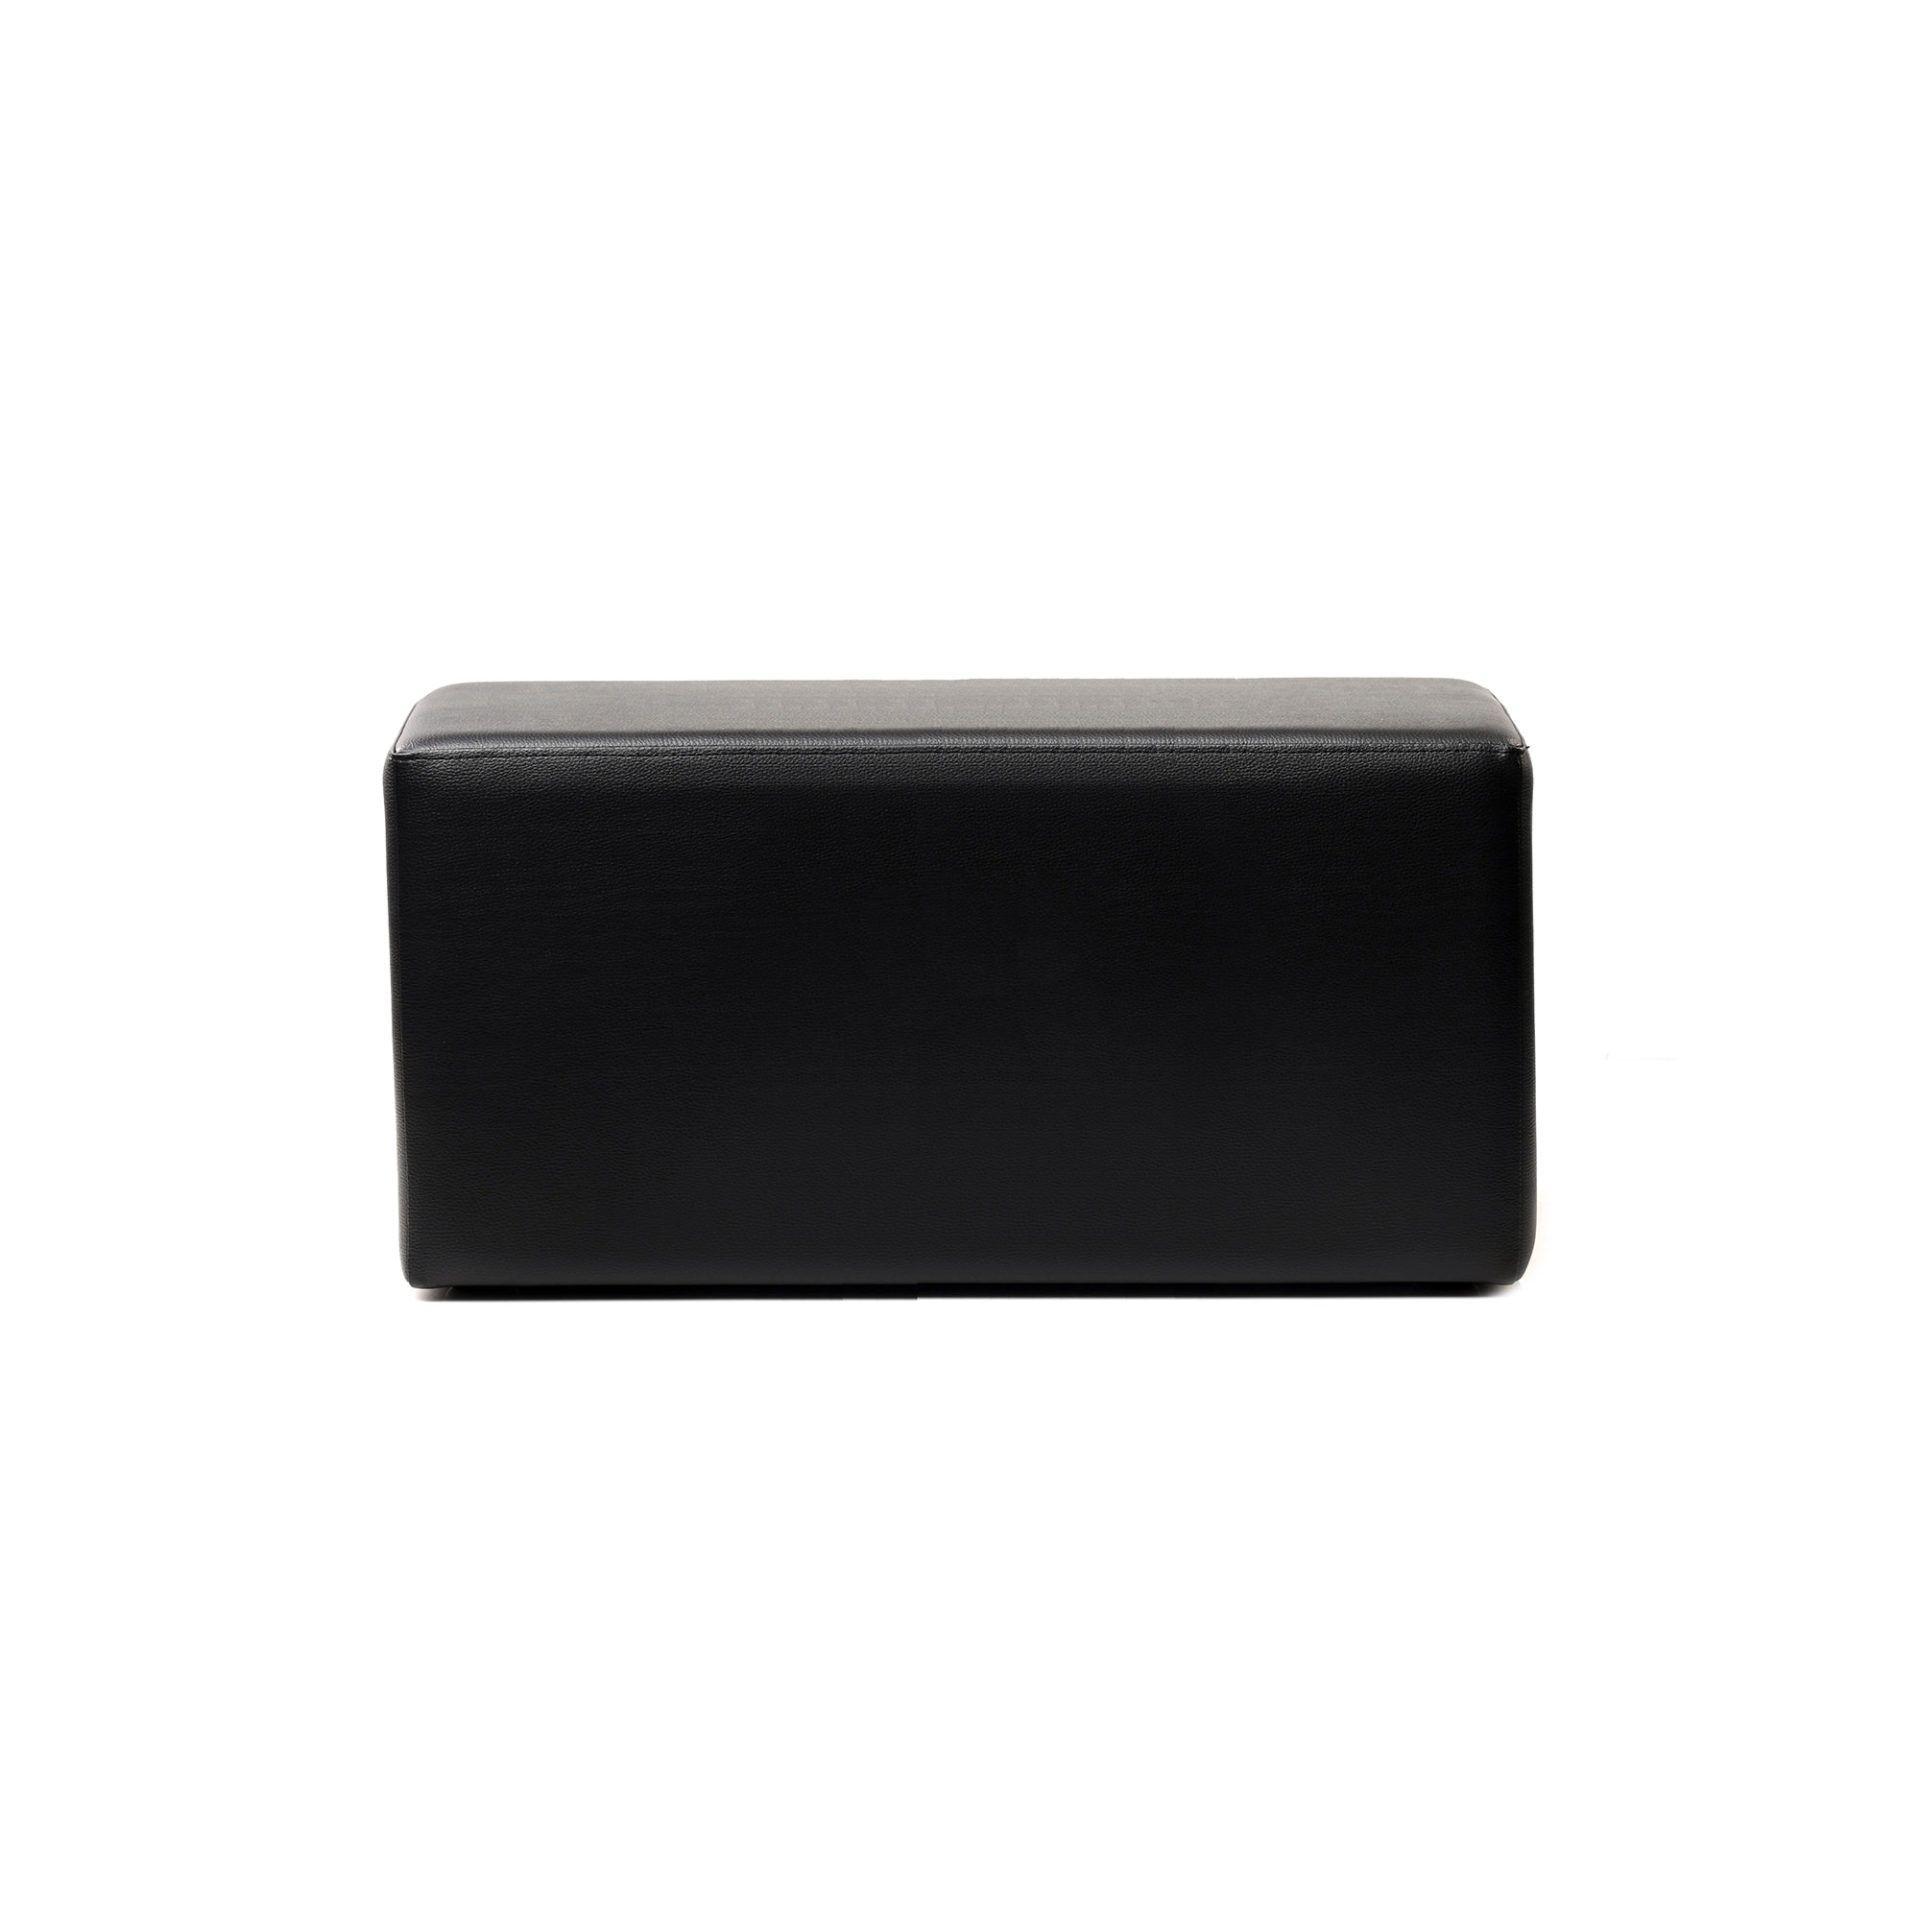 ottoman rectangle black01